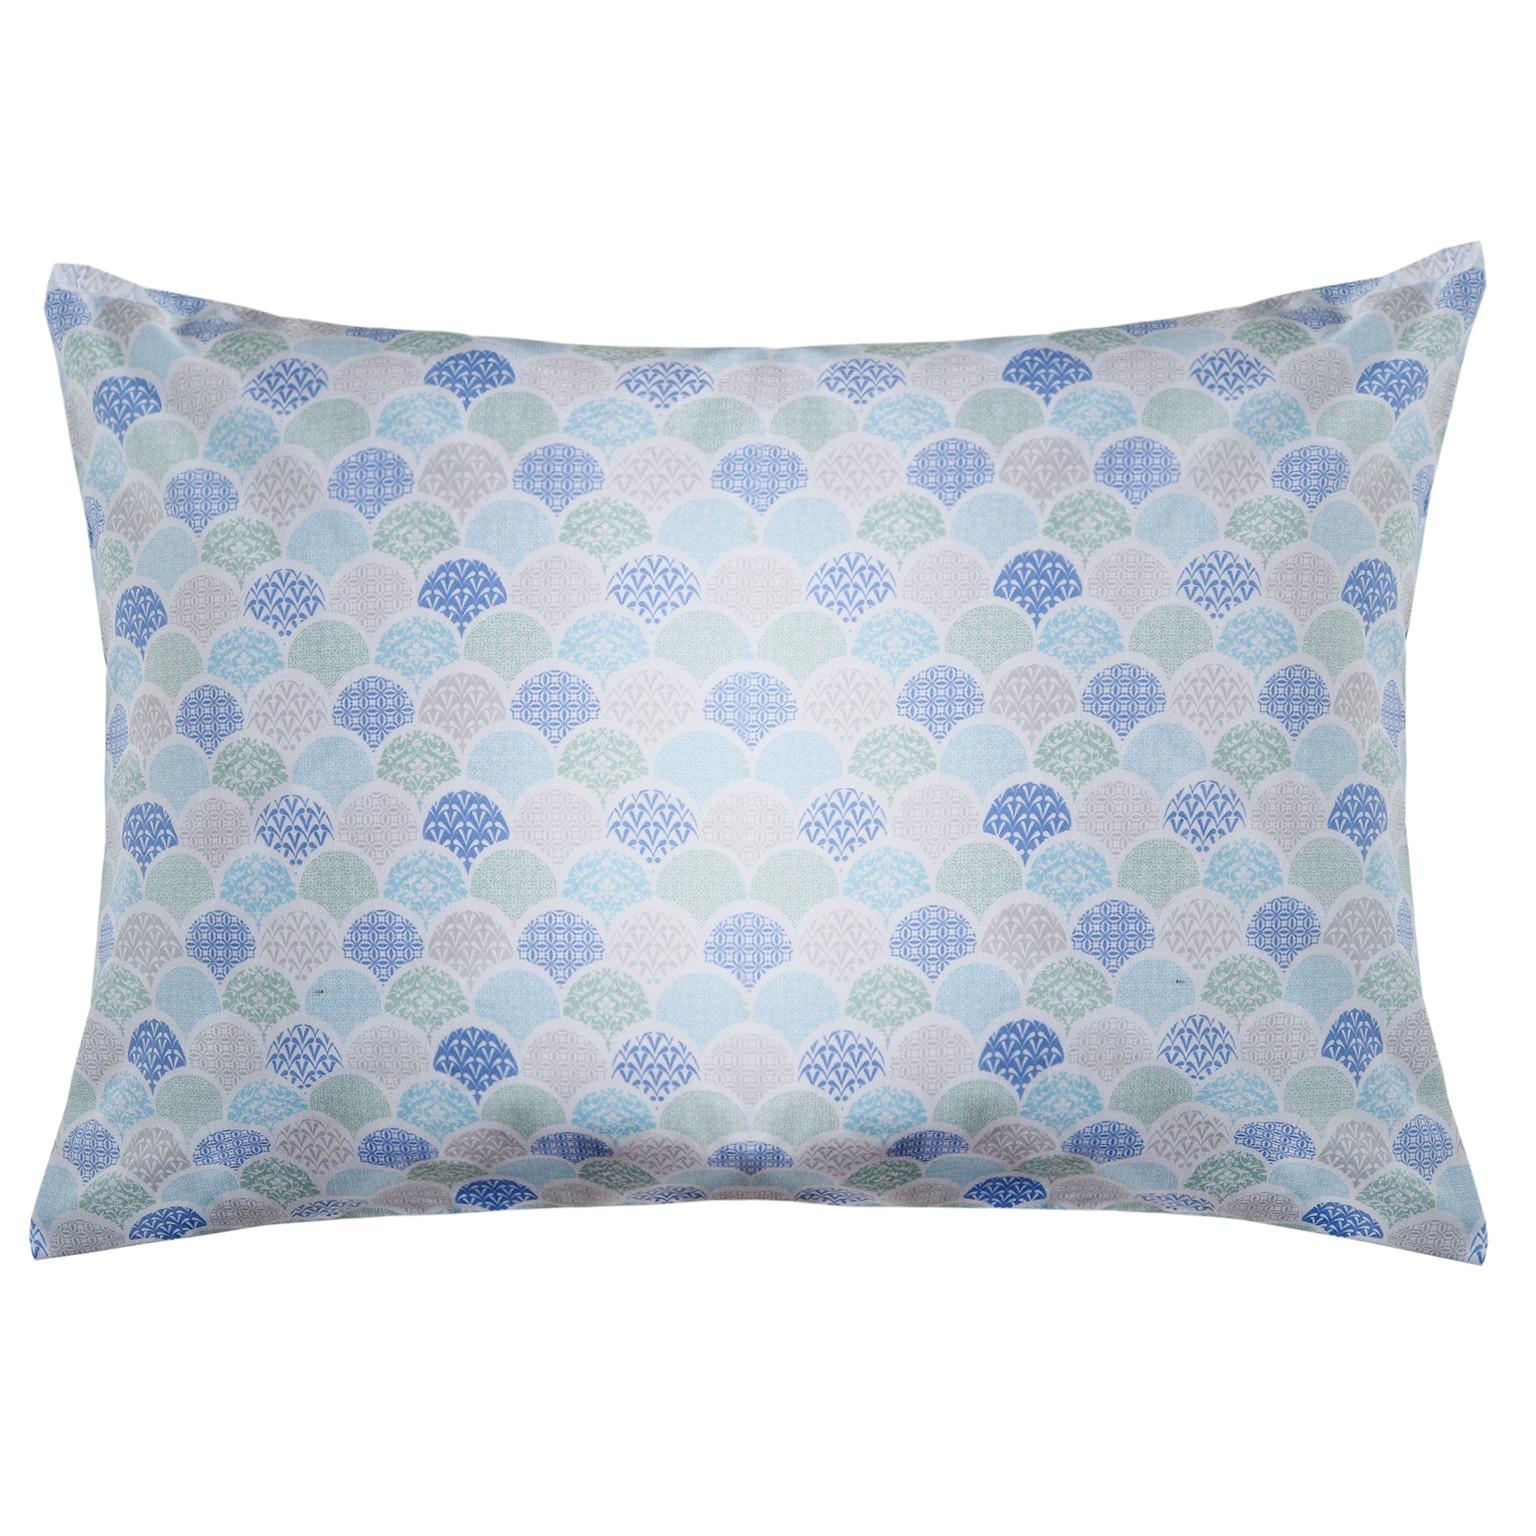 Fronha Royal 50 x 70 cm Deco Azul 100 Algodao - Santista